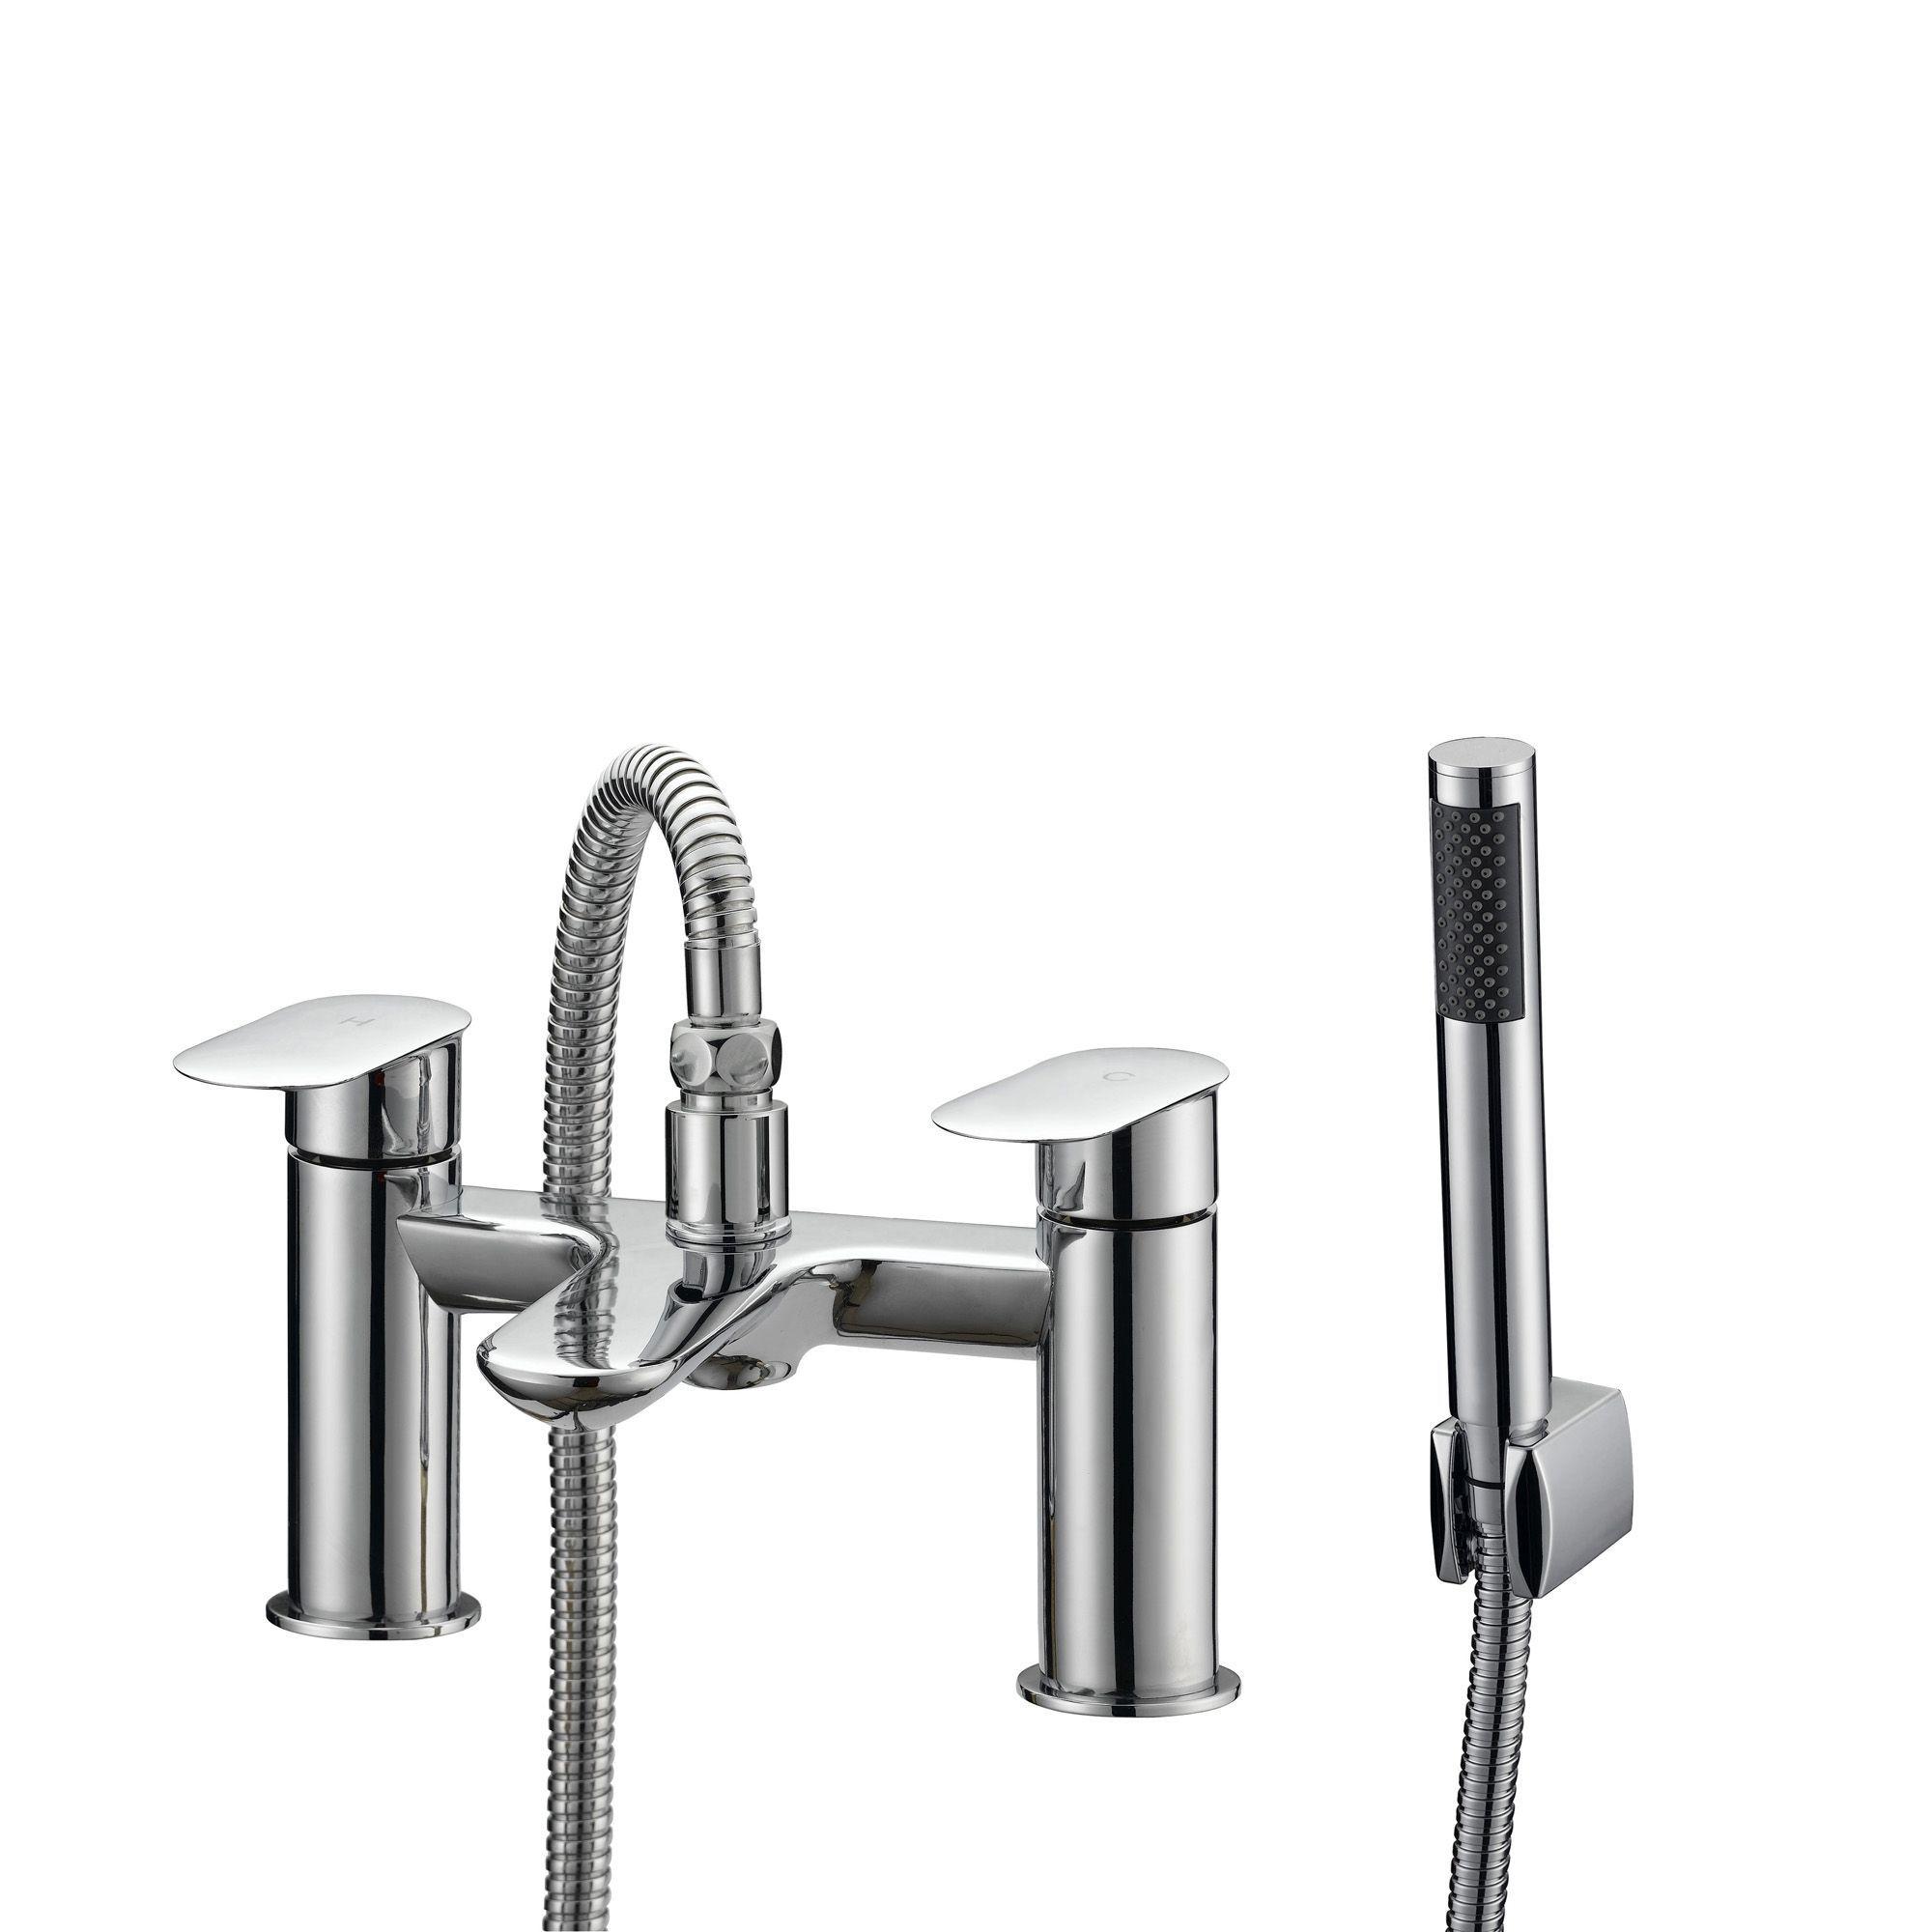 Cooke Amp Lewis Saru Chrome Bath Shower Mixer Tap